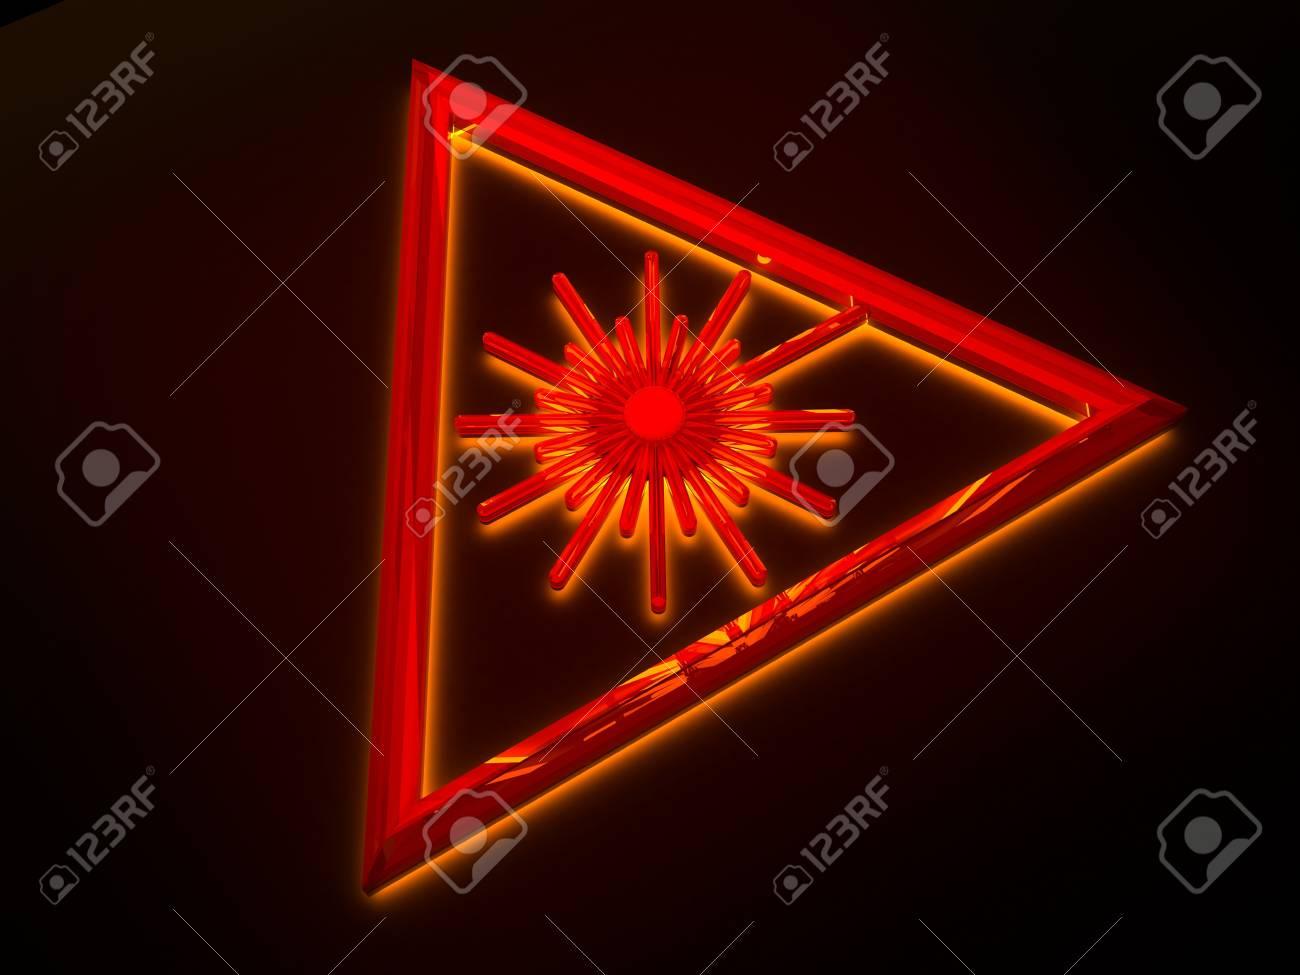 Sign - laser danger with light Stock Photo - 7508287